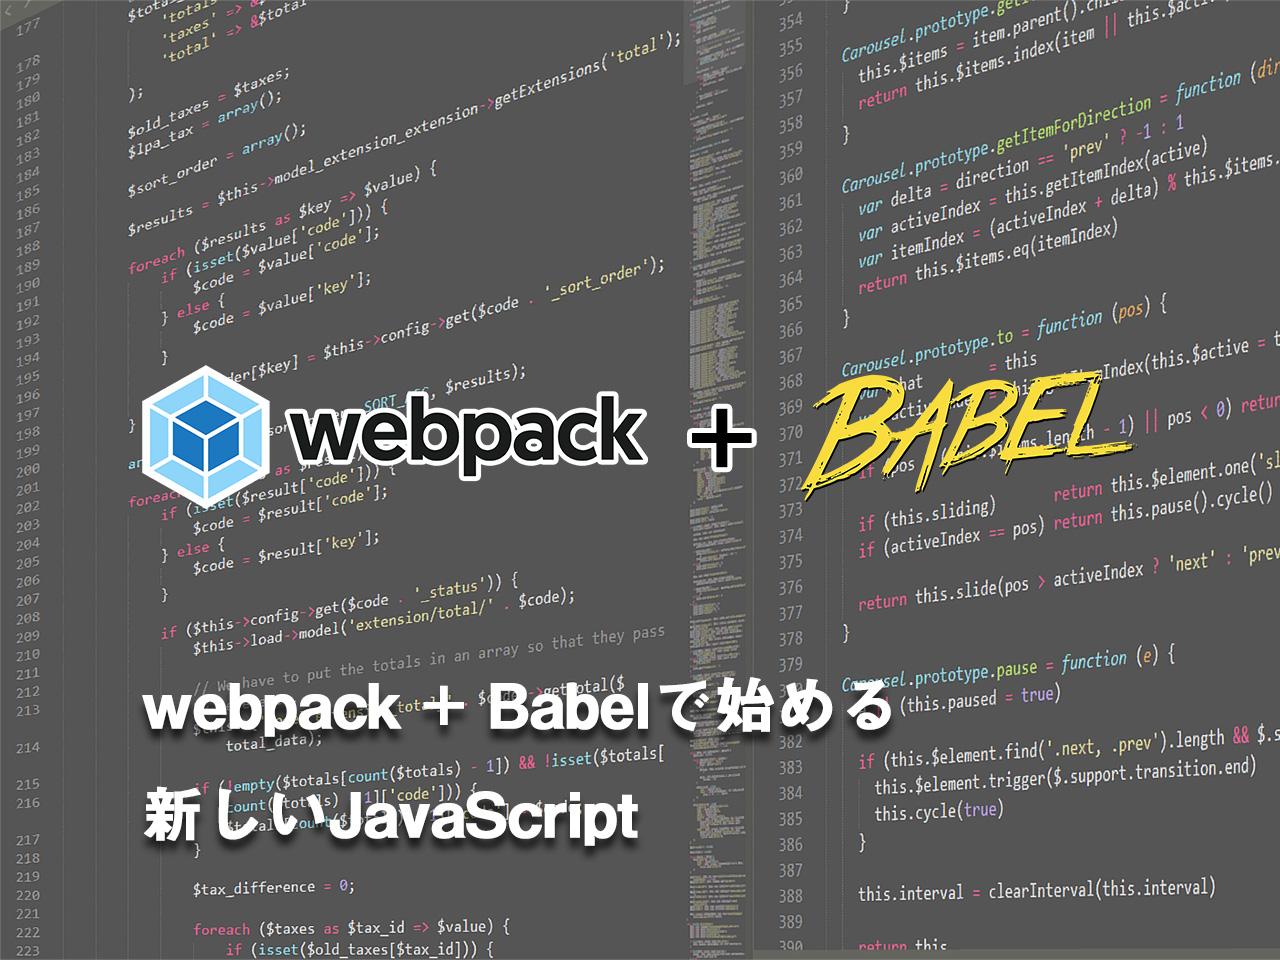 webpack + Babelで始める新しいJavaScript